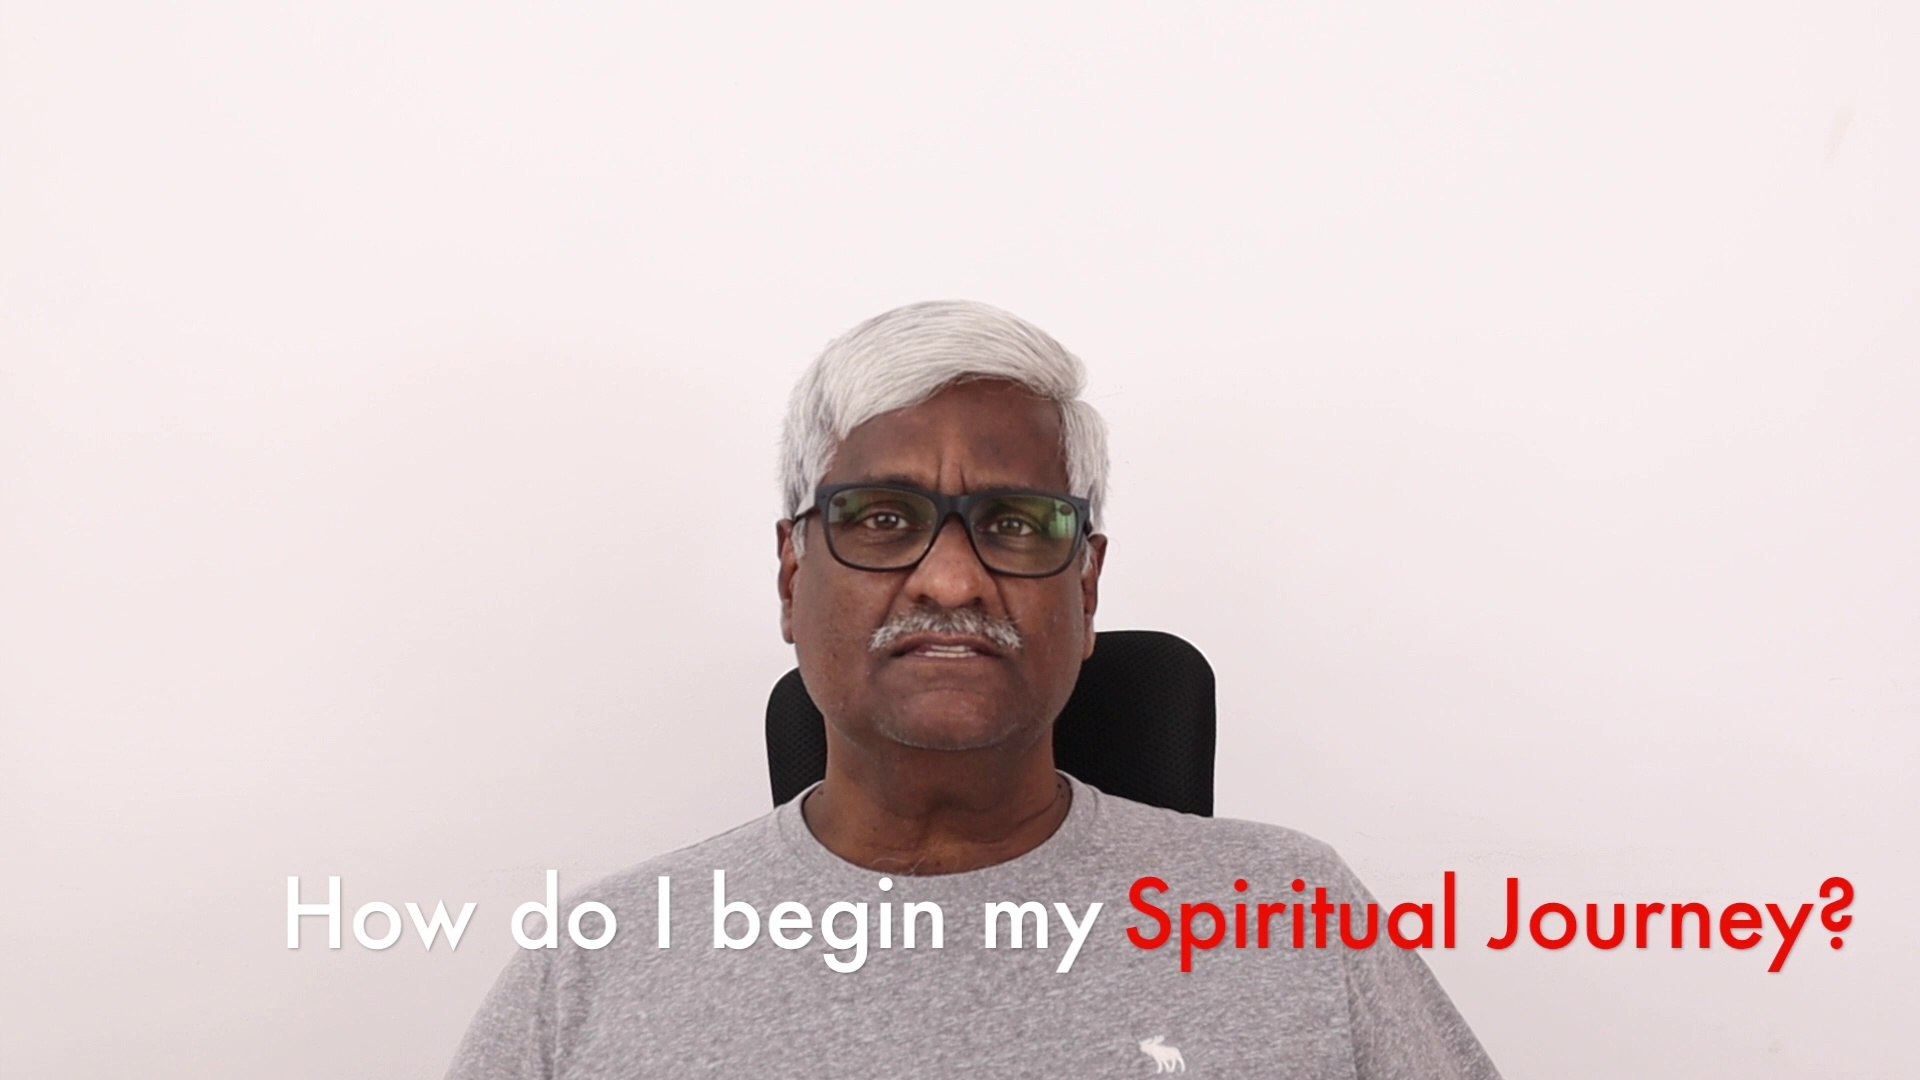 How do I begin my Spiritual Journey? | Spiritual Quest | EP 06 | Spirituality 101 Series | KrsnaKnow